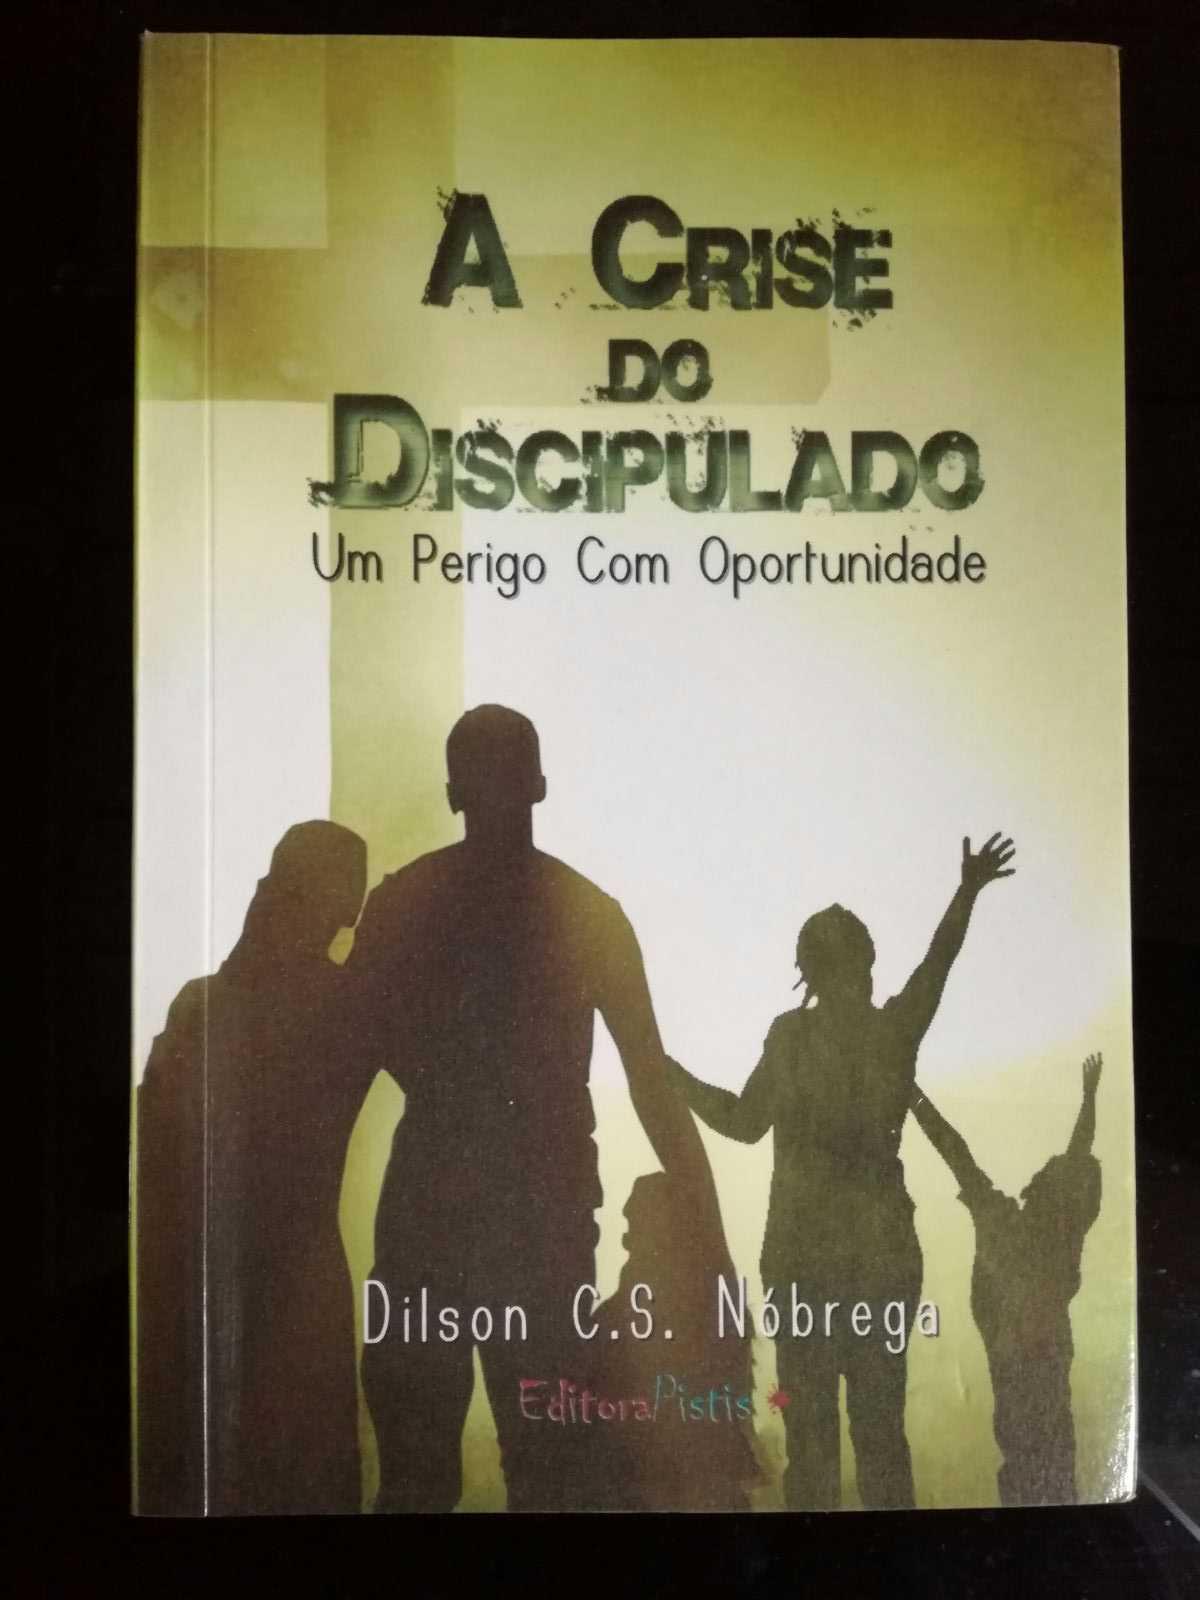 A Crise do Discipulado